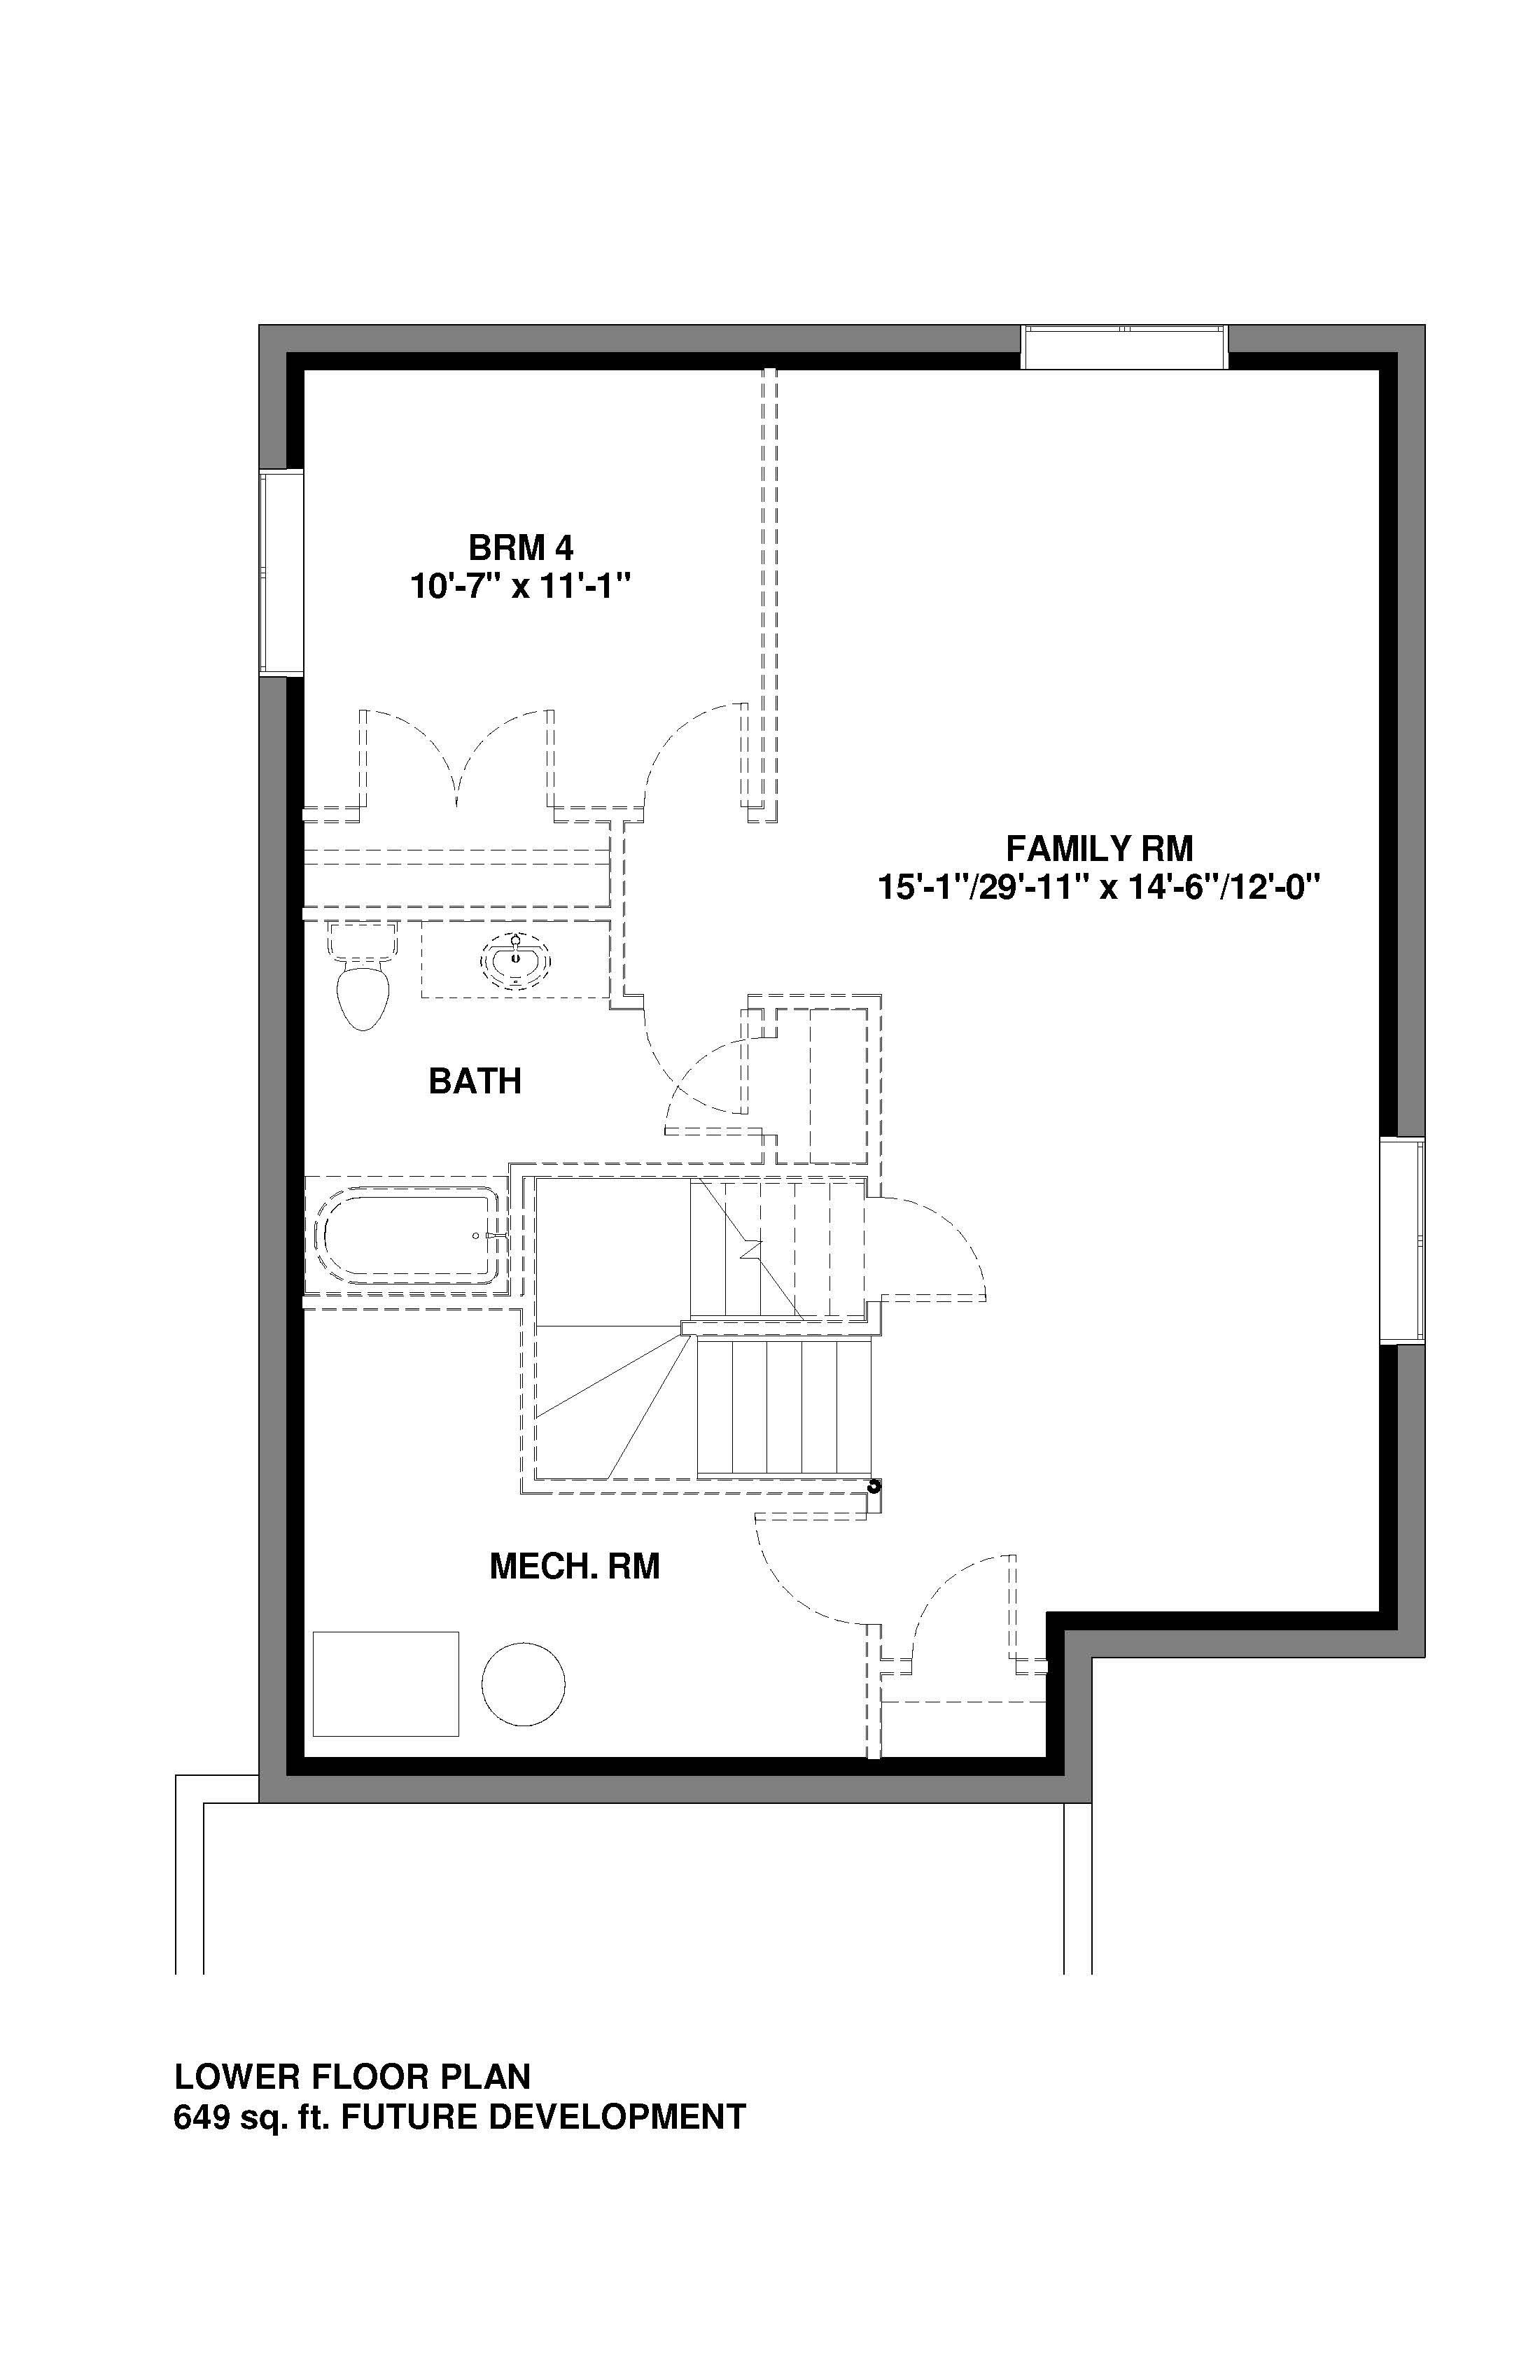 Lower Floor Future Development  649 sq ft